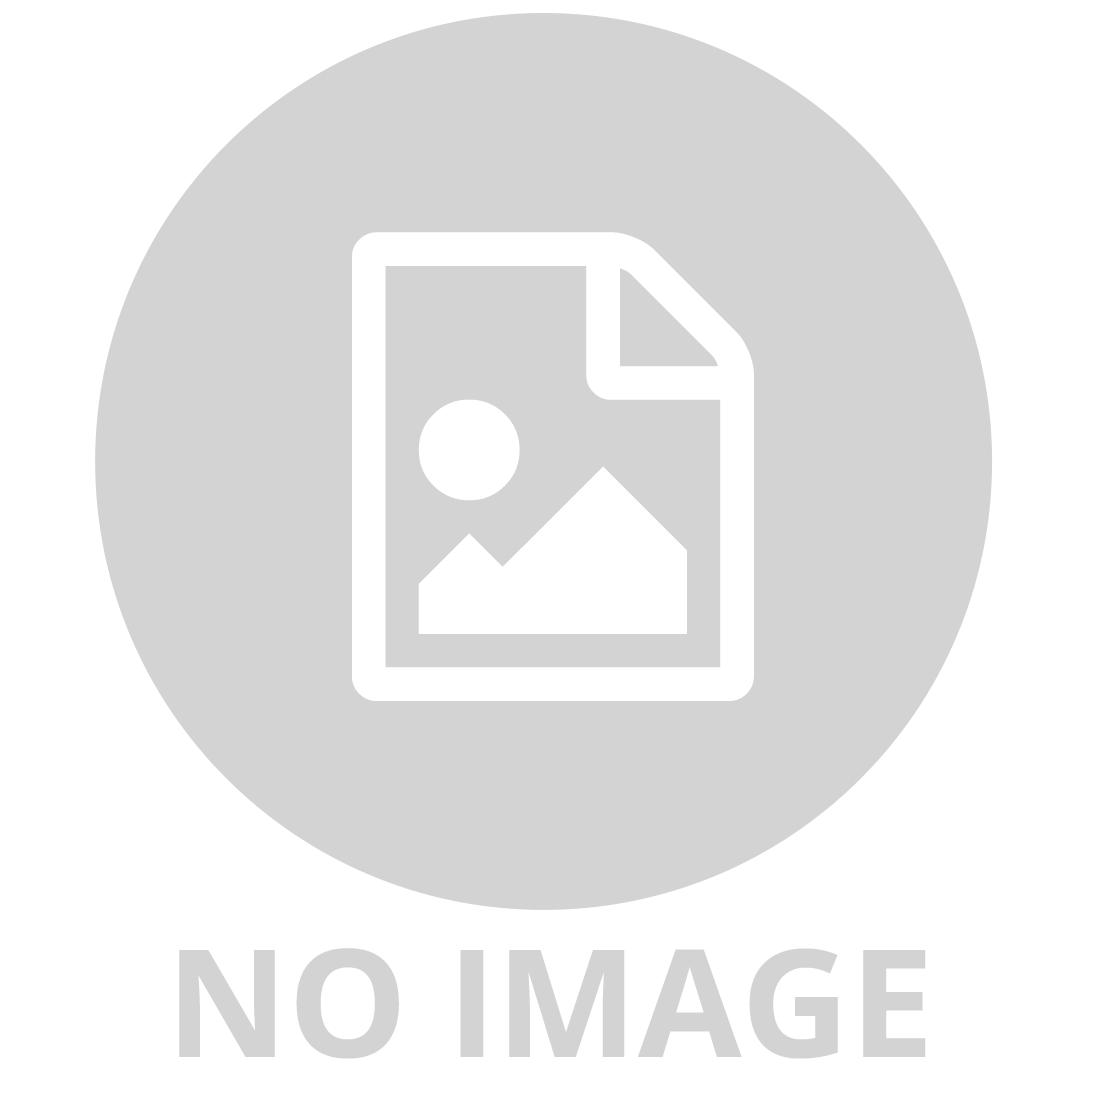 FELT CREATIONS HOSPITAL